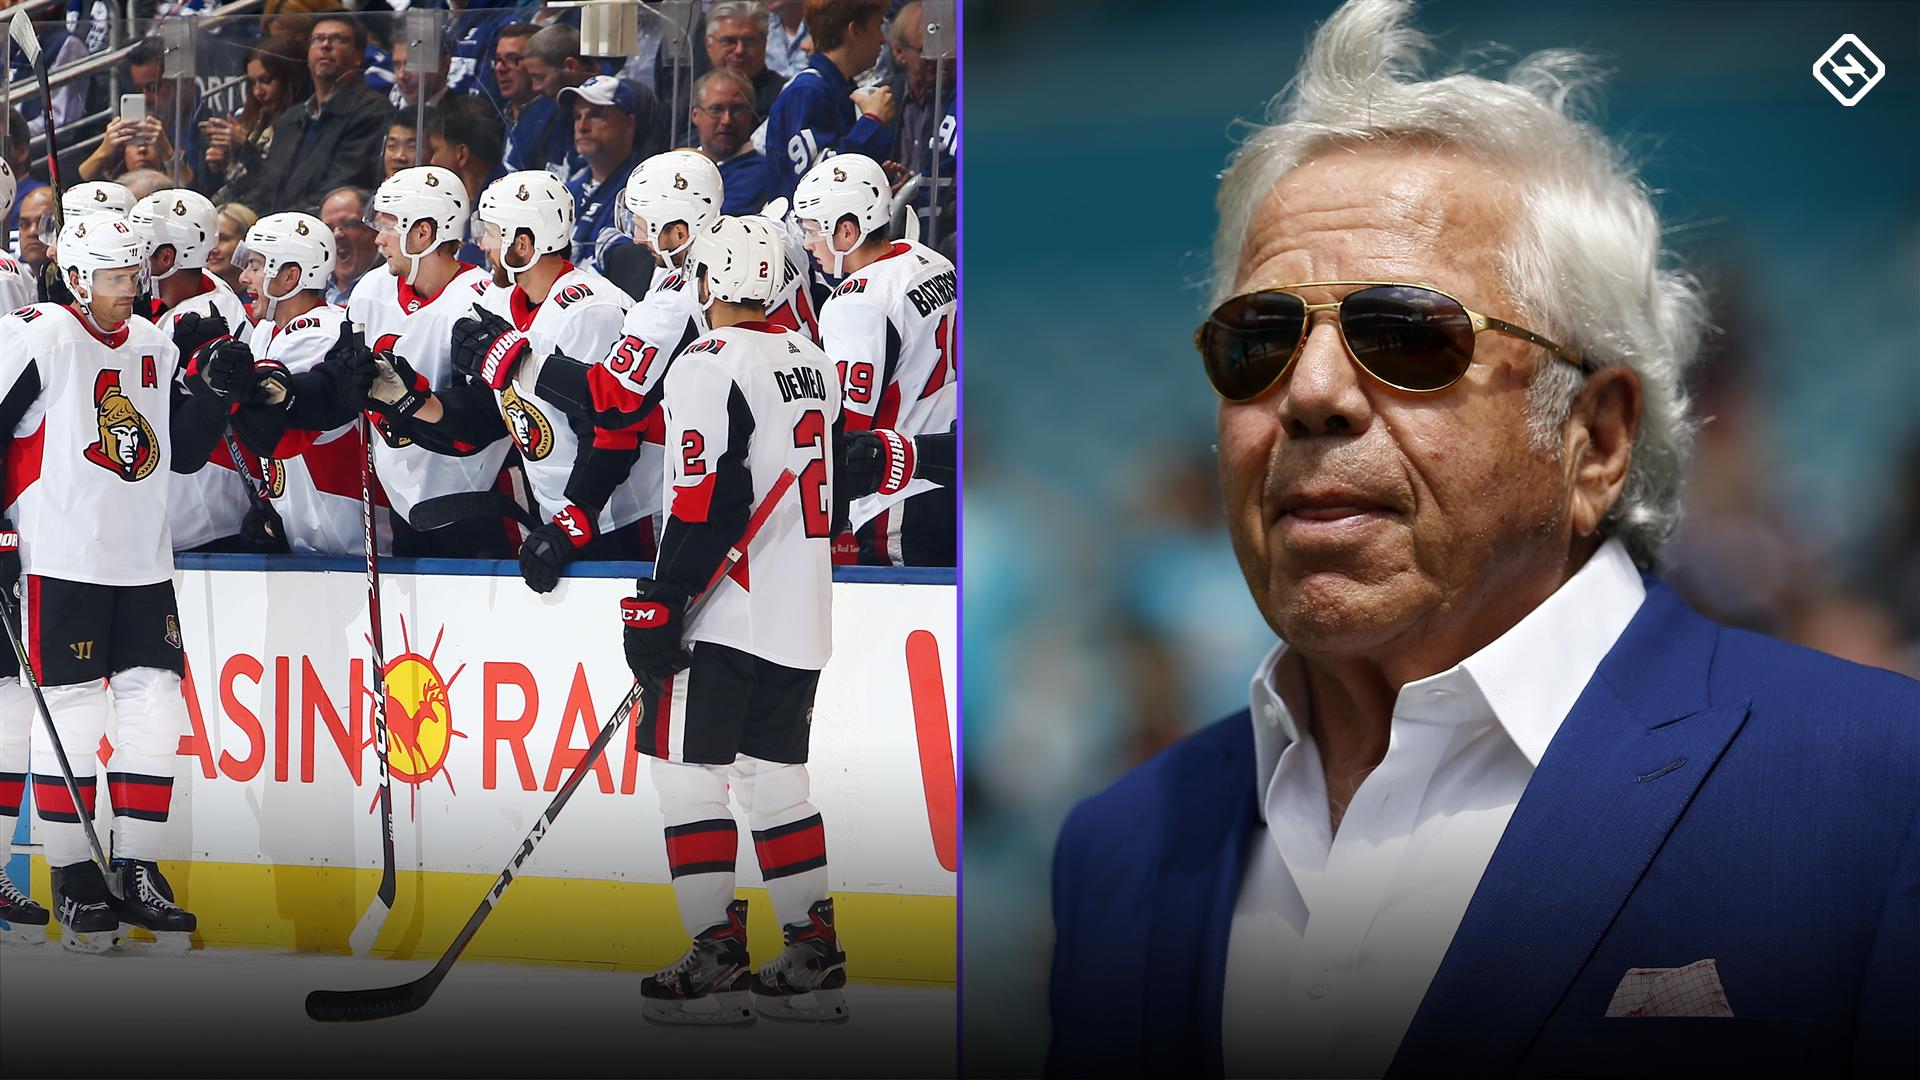 Ottawa Senators for sale? Snapchat post sparks theories Robert Kraft is buying team